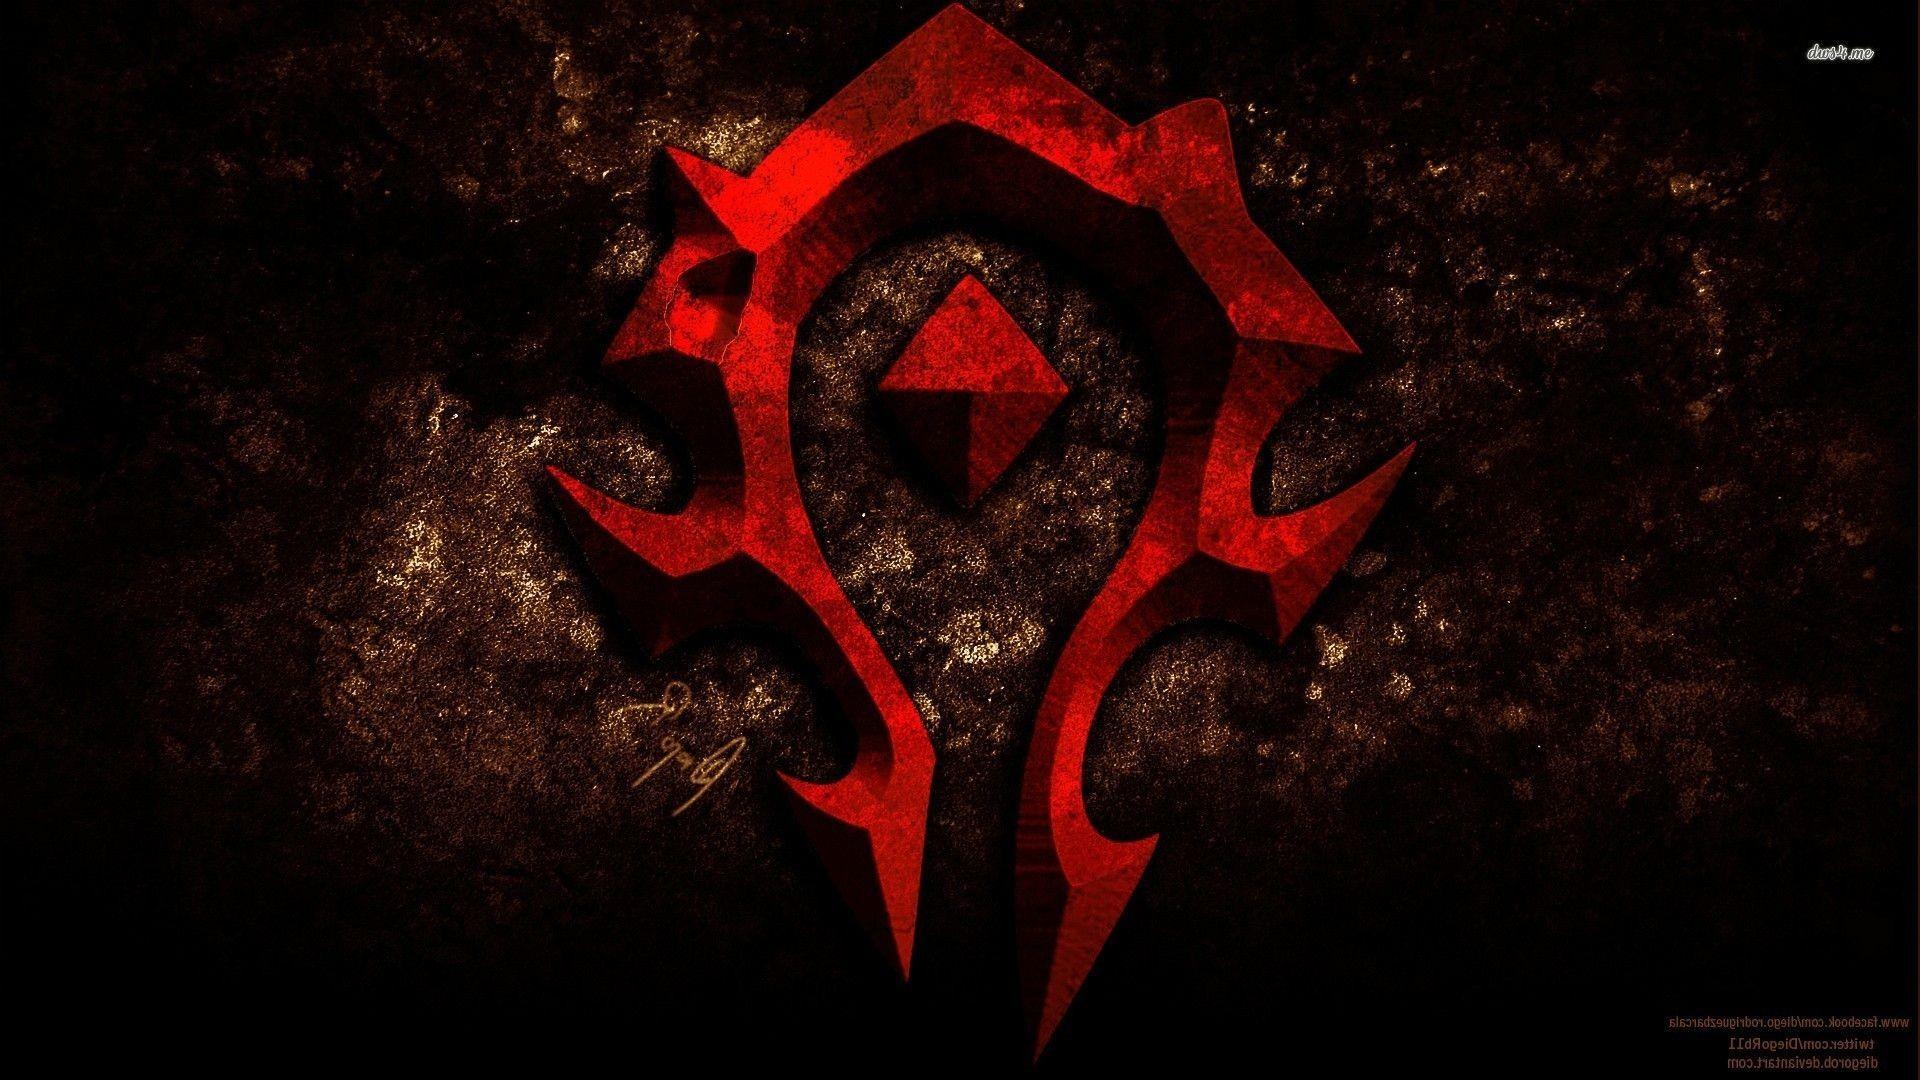 Horde – World of Warcraft Game HD desktop wallpaper, World of Warcraft  wallpaper, WOW wallpaper, Horde wallpaper – Games no.